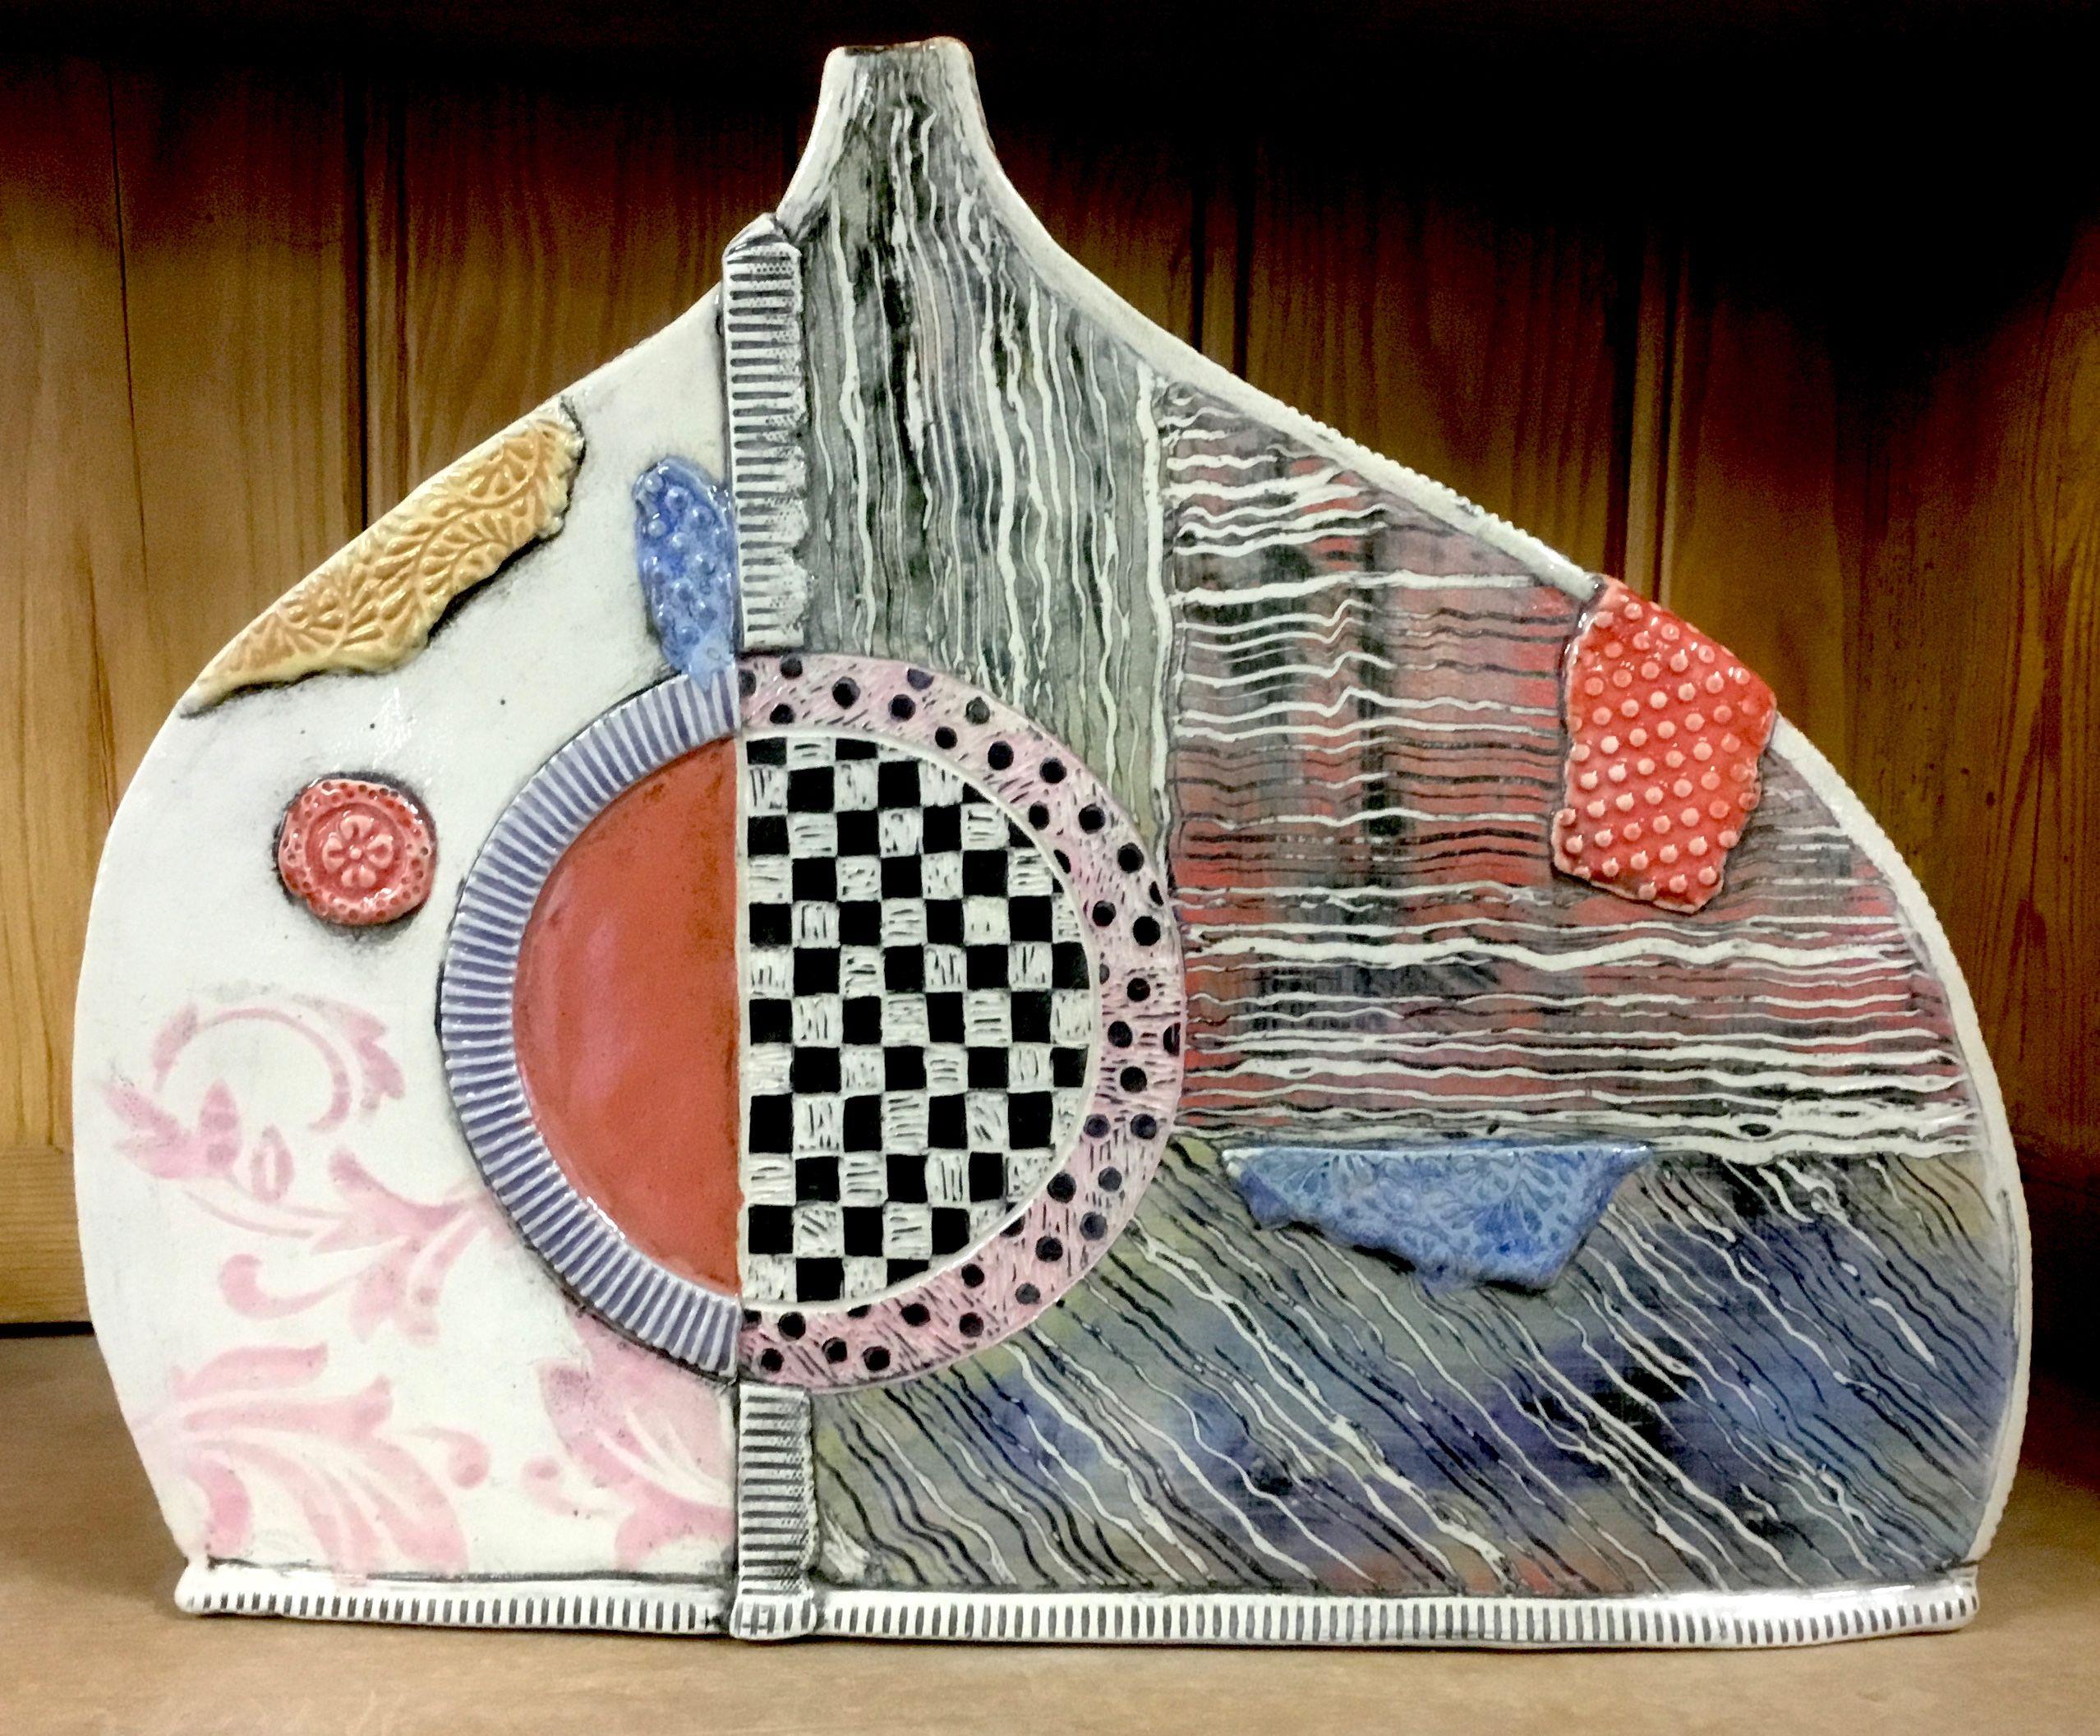 Handmade Hand Built Patchwork Bottle With Checkered Sgraffito Slip Transfer And Coyote Underglazes Marbling Design Glazes Inc Slab Pottery Sgraffito Handmade